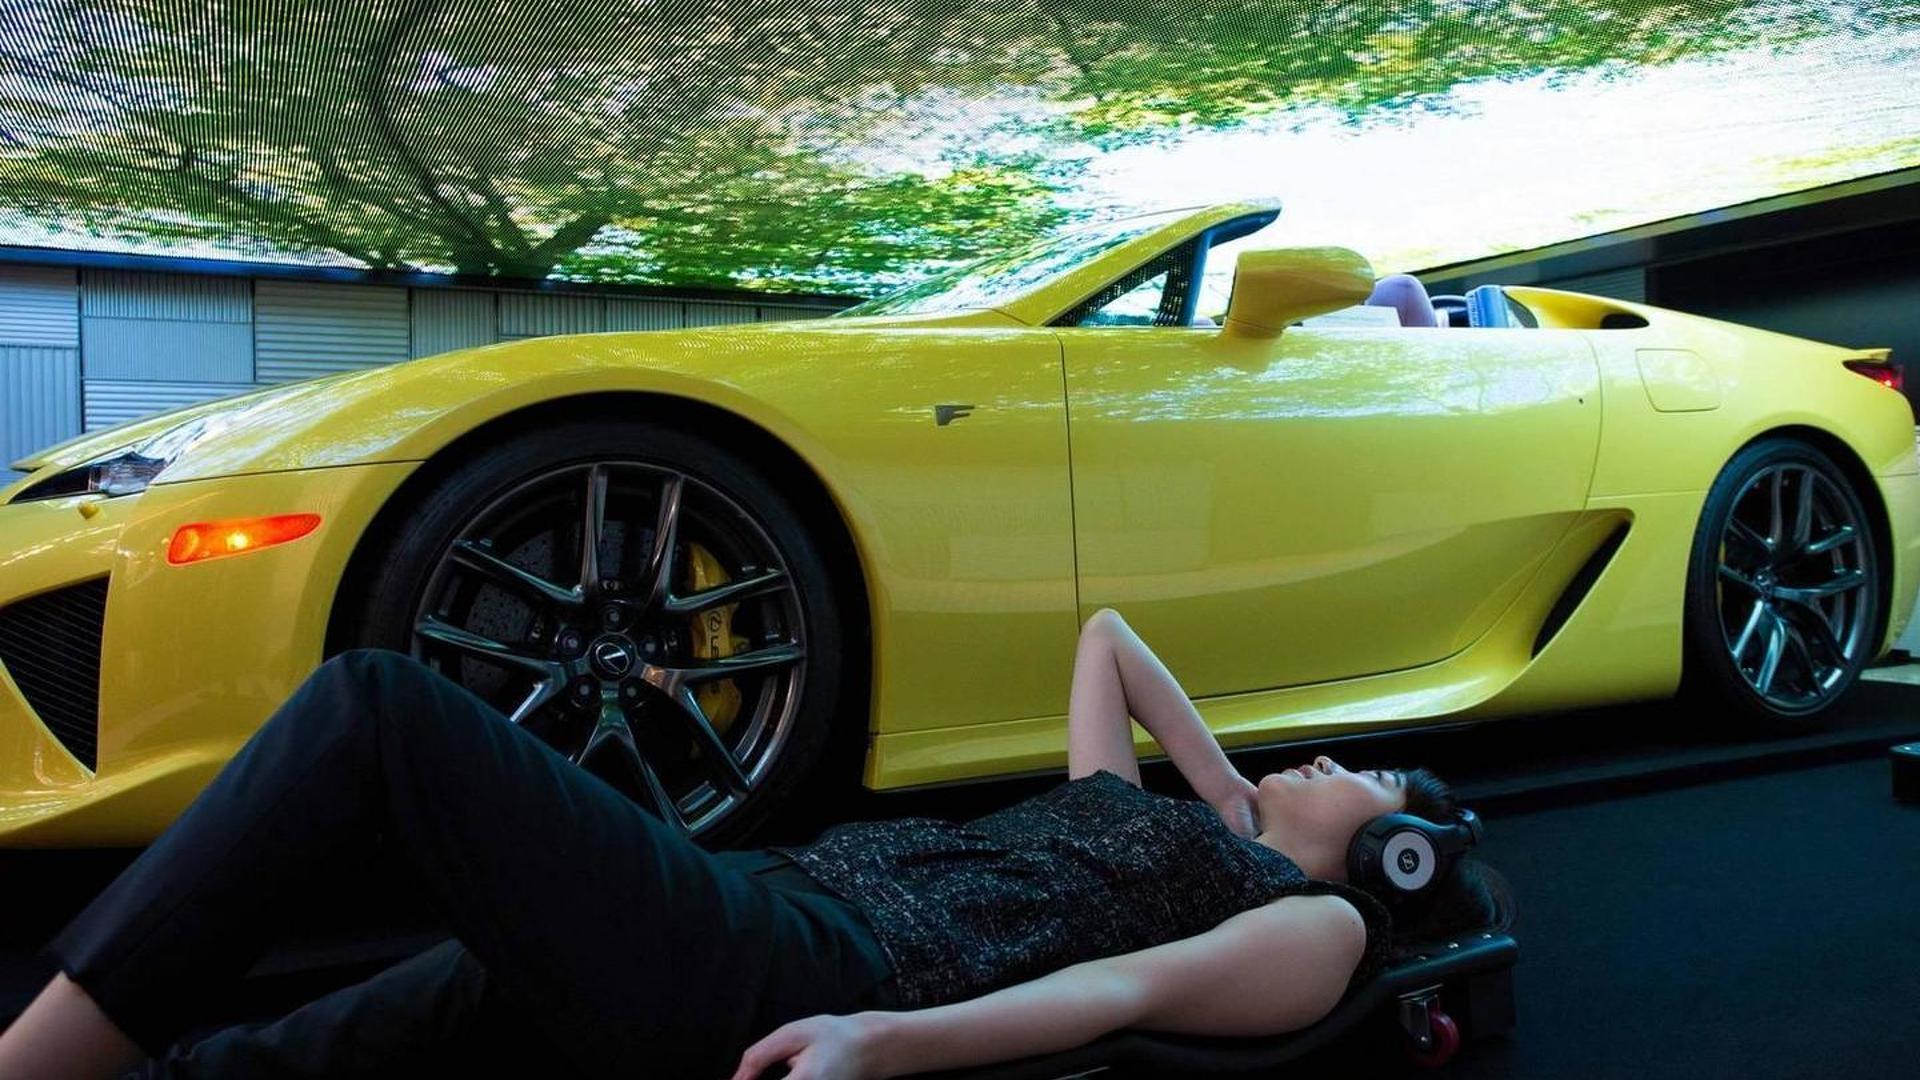 https://icdn-3.motor1.com/images/mgl/R9249/s1/2015-545868-lexus-lfa-roadster-2015-media-ambition-tokyo1.jpg